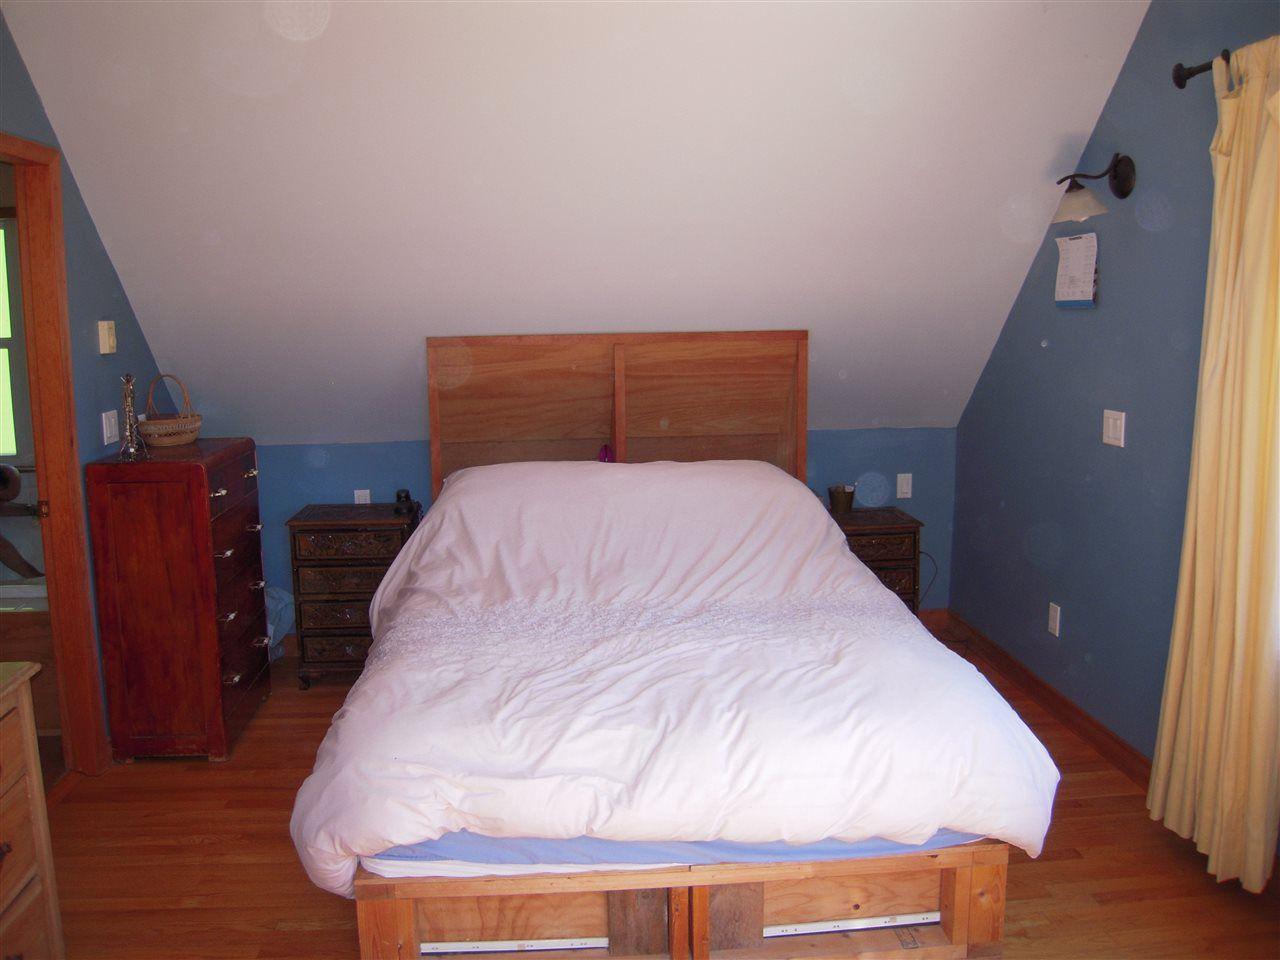 Photo 16: Photos: 2670 LOWER Road: Roberts Creek House for sale (Sunshine Coast)  : MLS®# R2096275